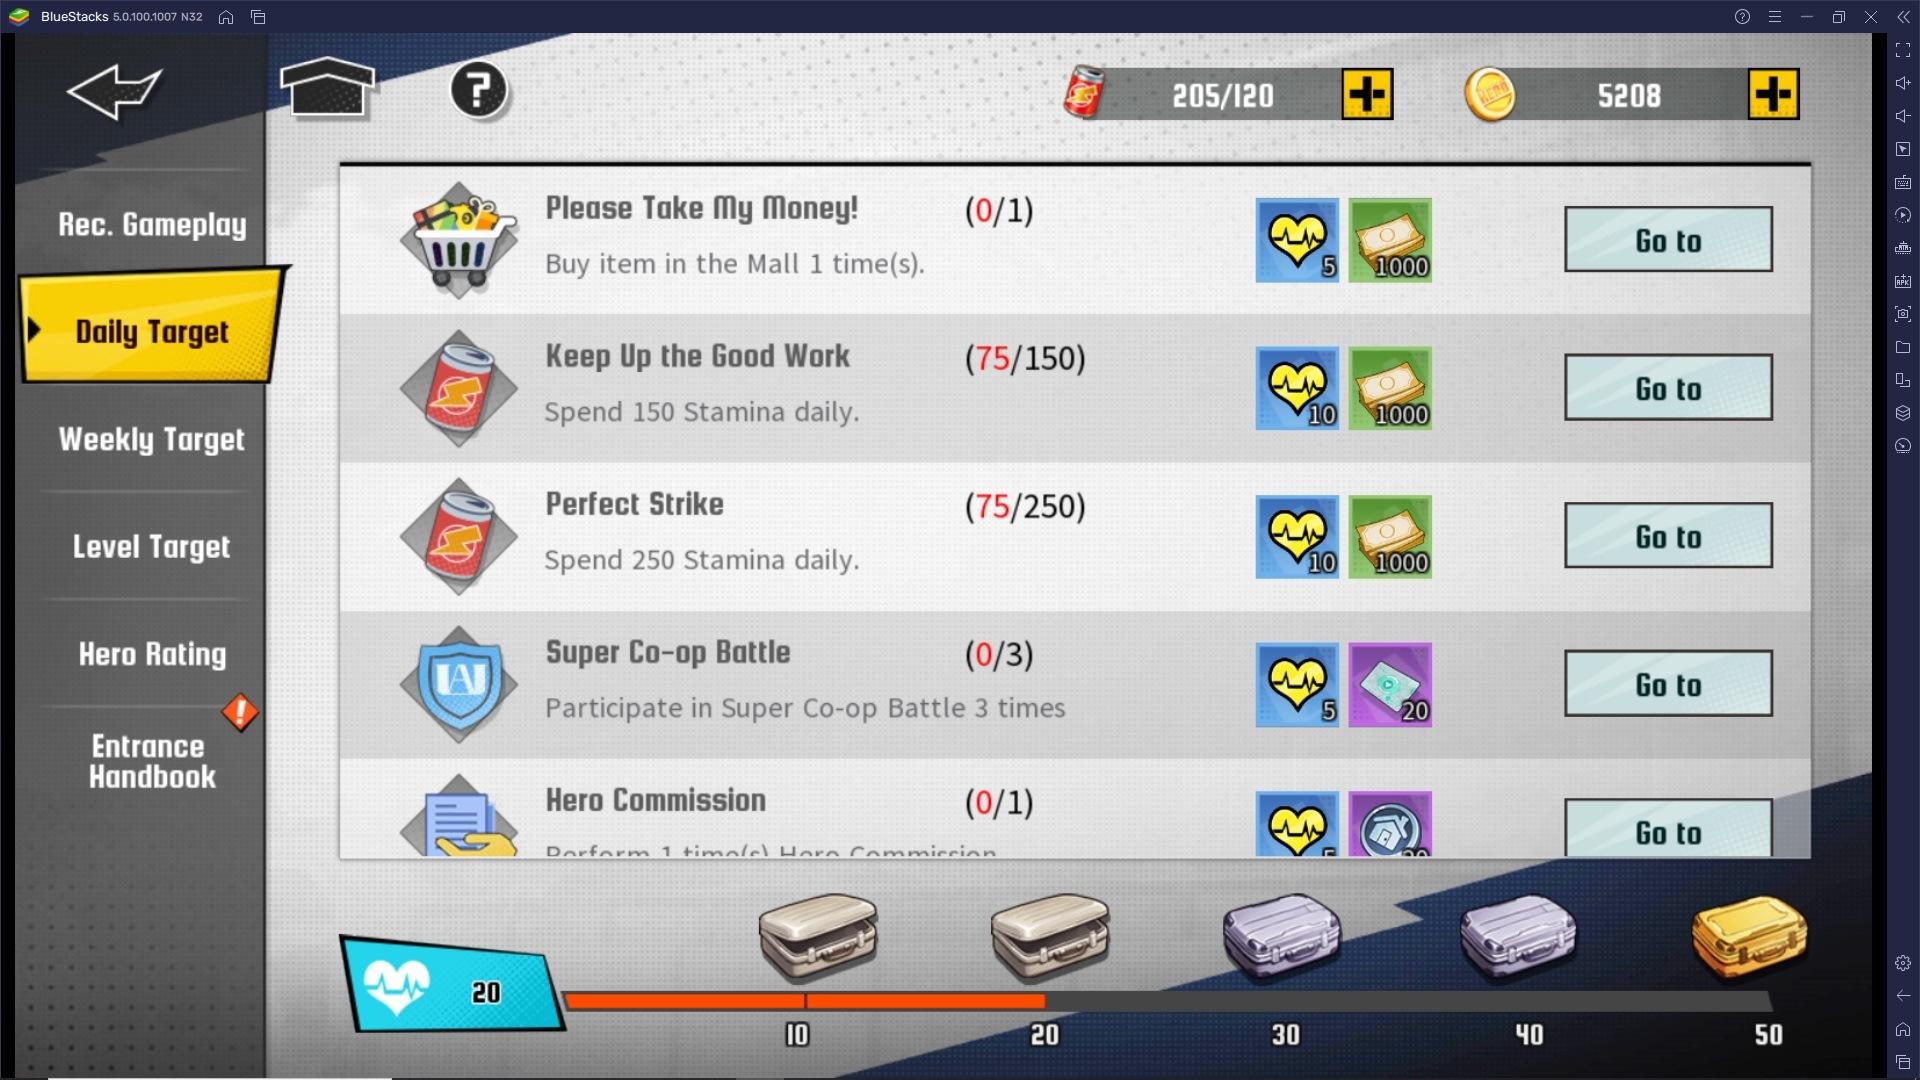 Come ottenere Hero Coins in My Hero Academia: The Strongest Hero